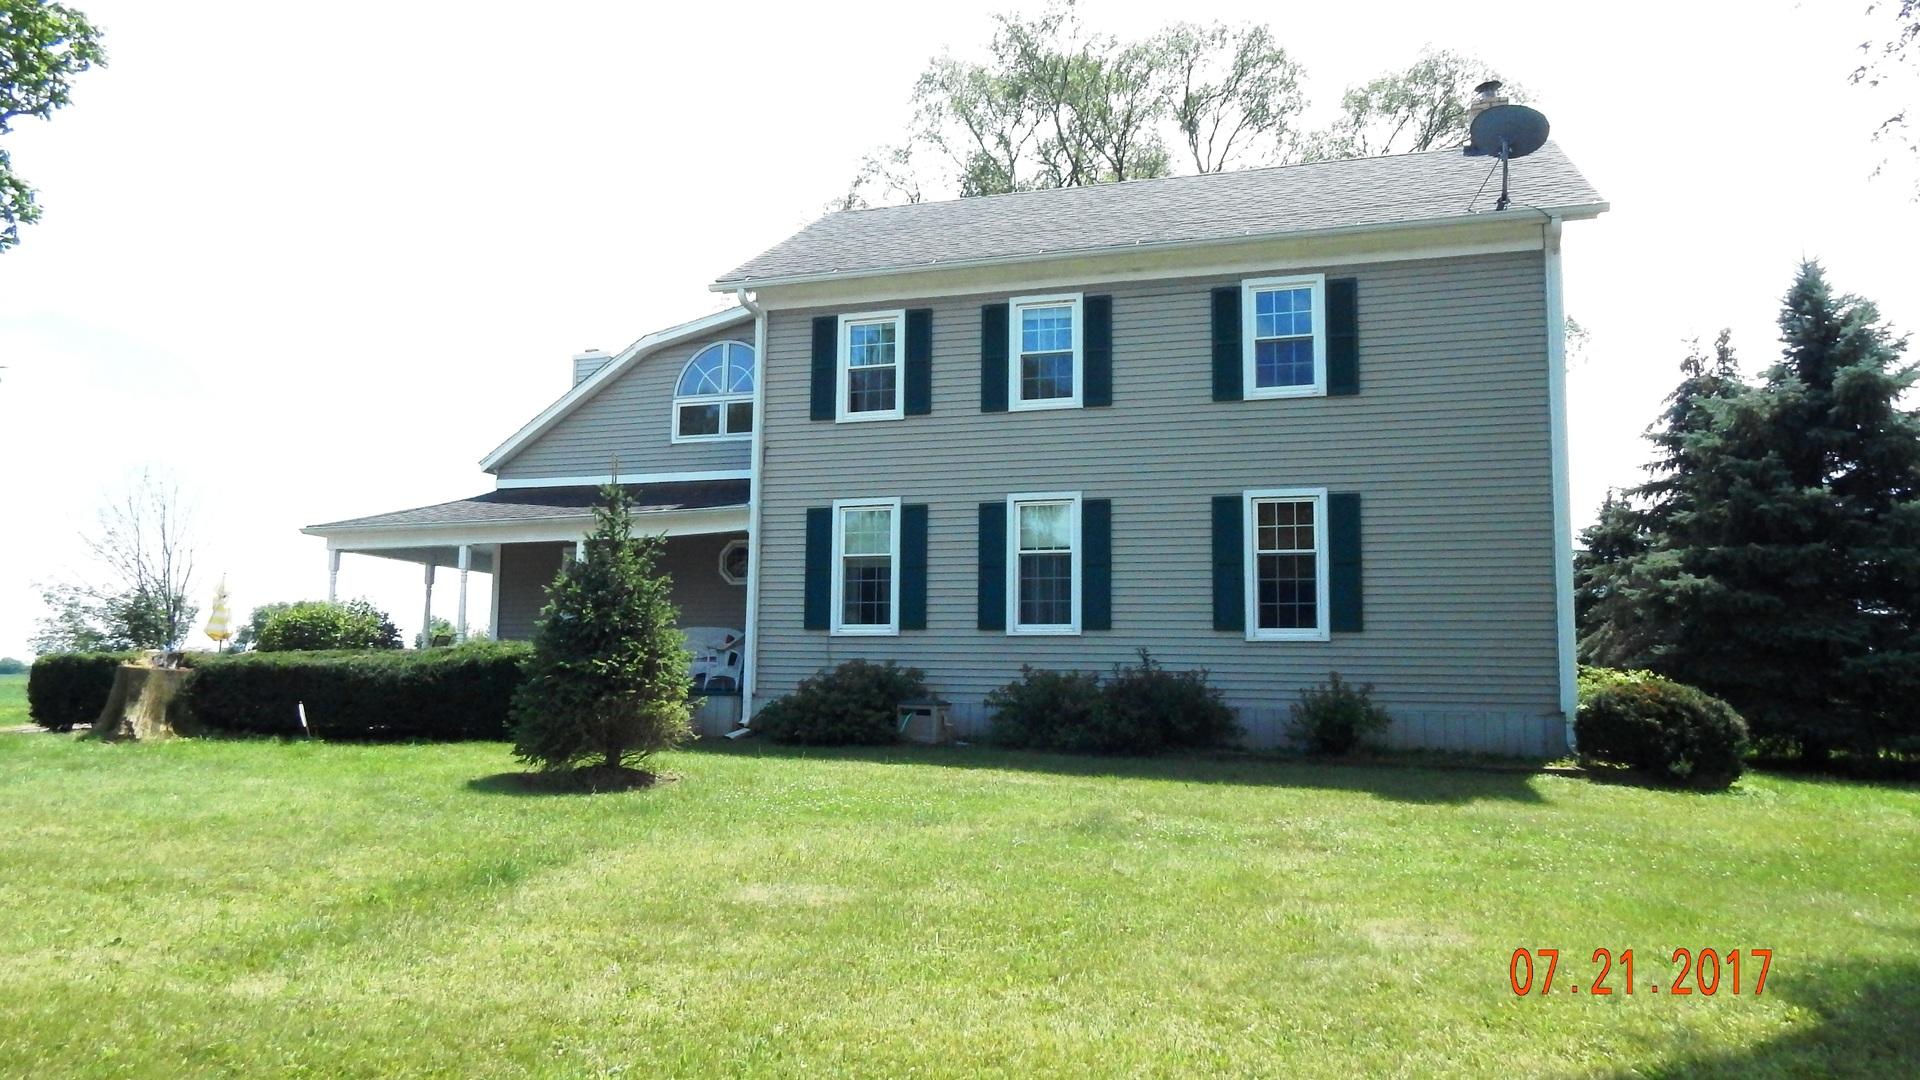 Farmhouse, 2 Stories - BEECHER, IL (photo 1)